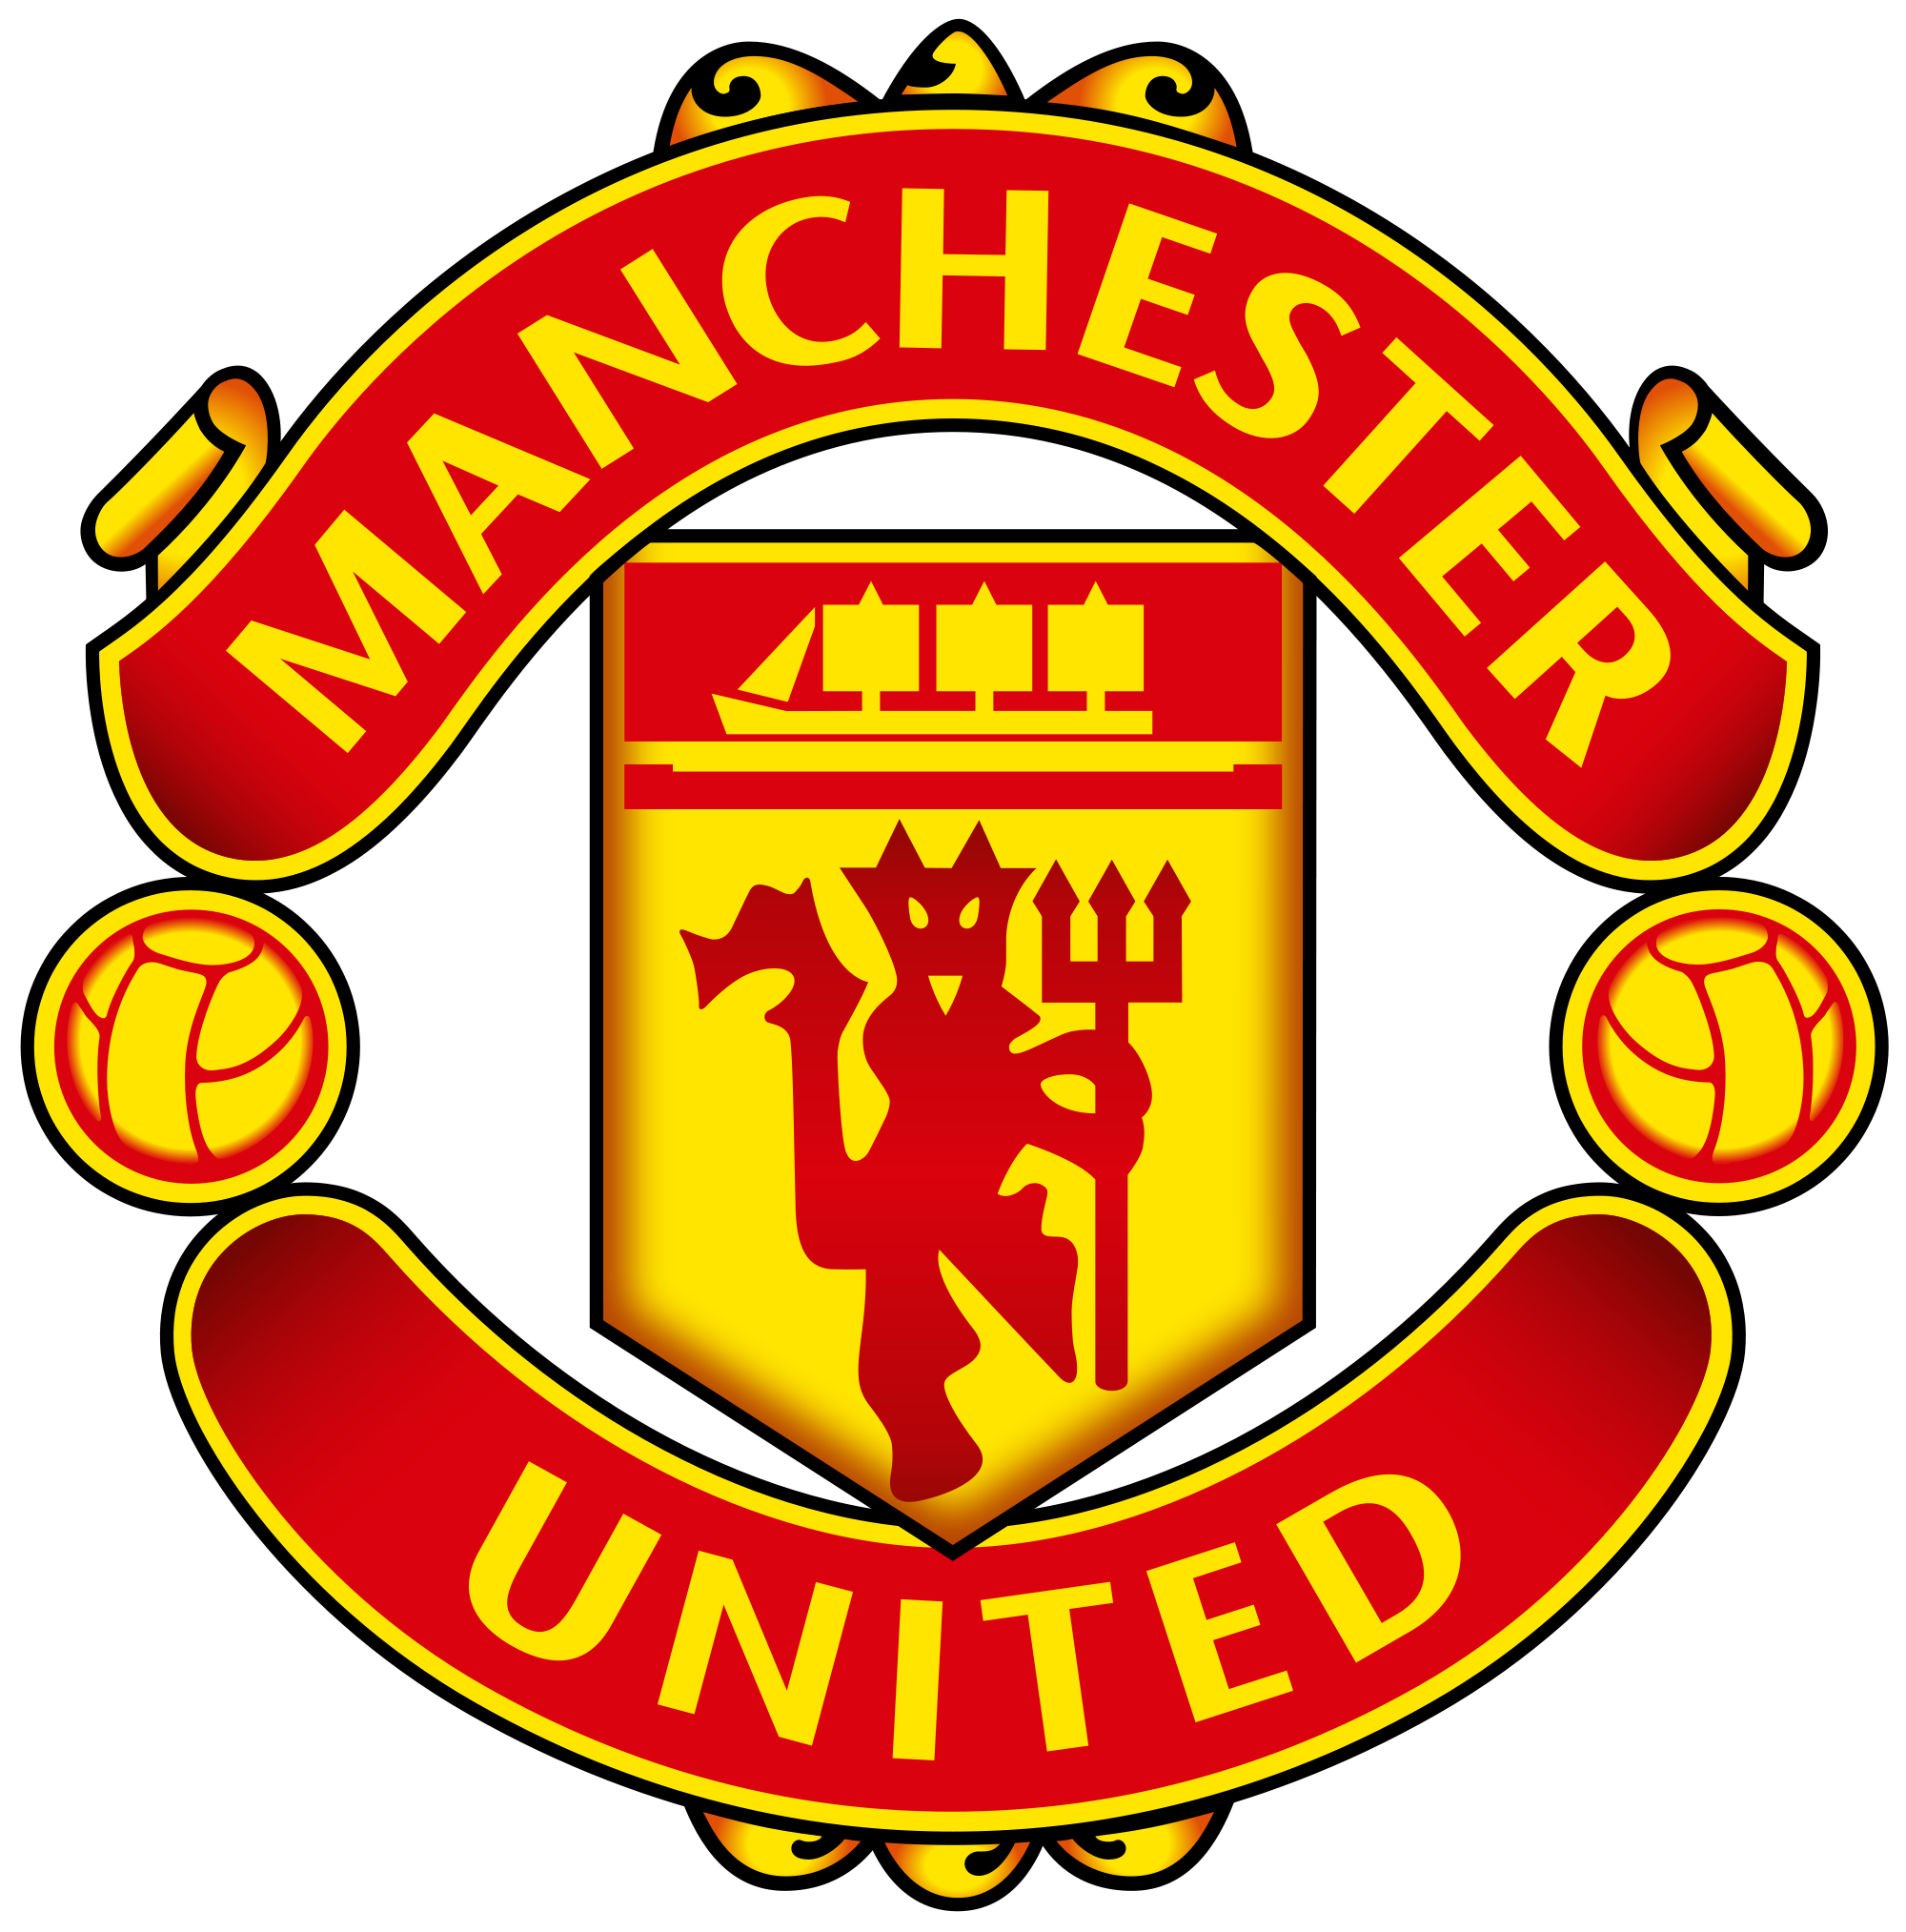 Manchester United Manchester united logo, Manchester